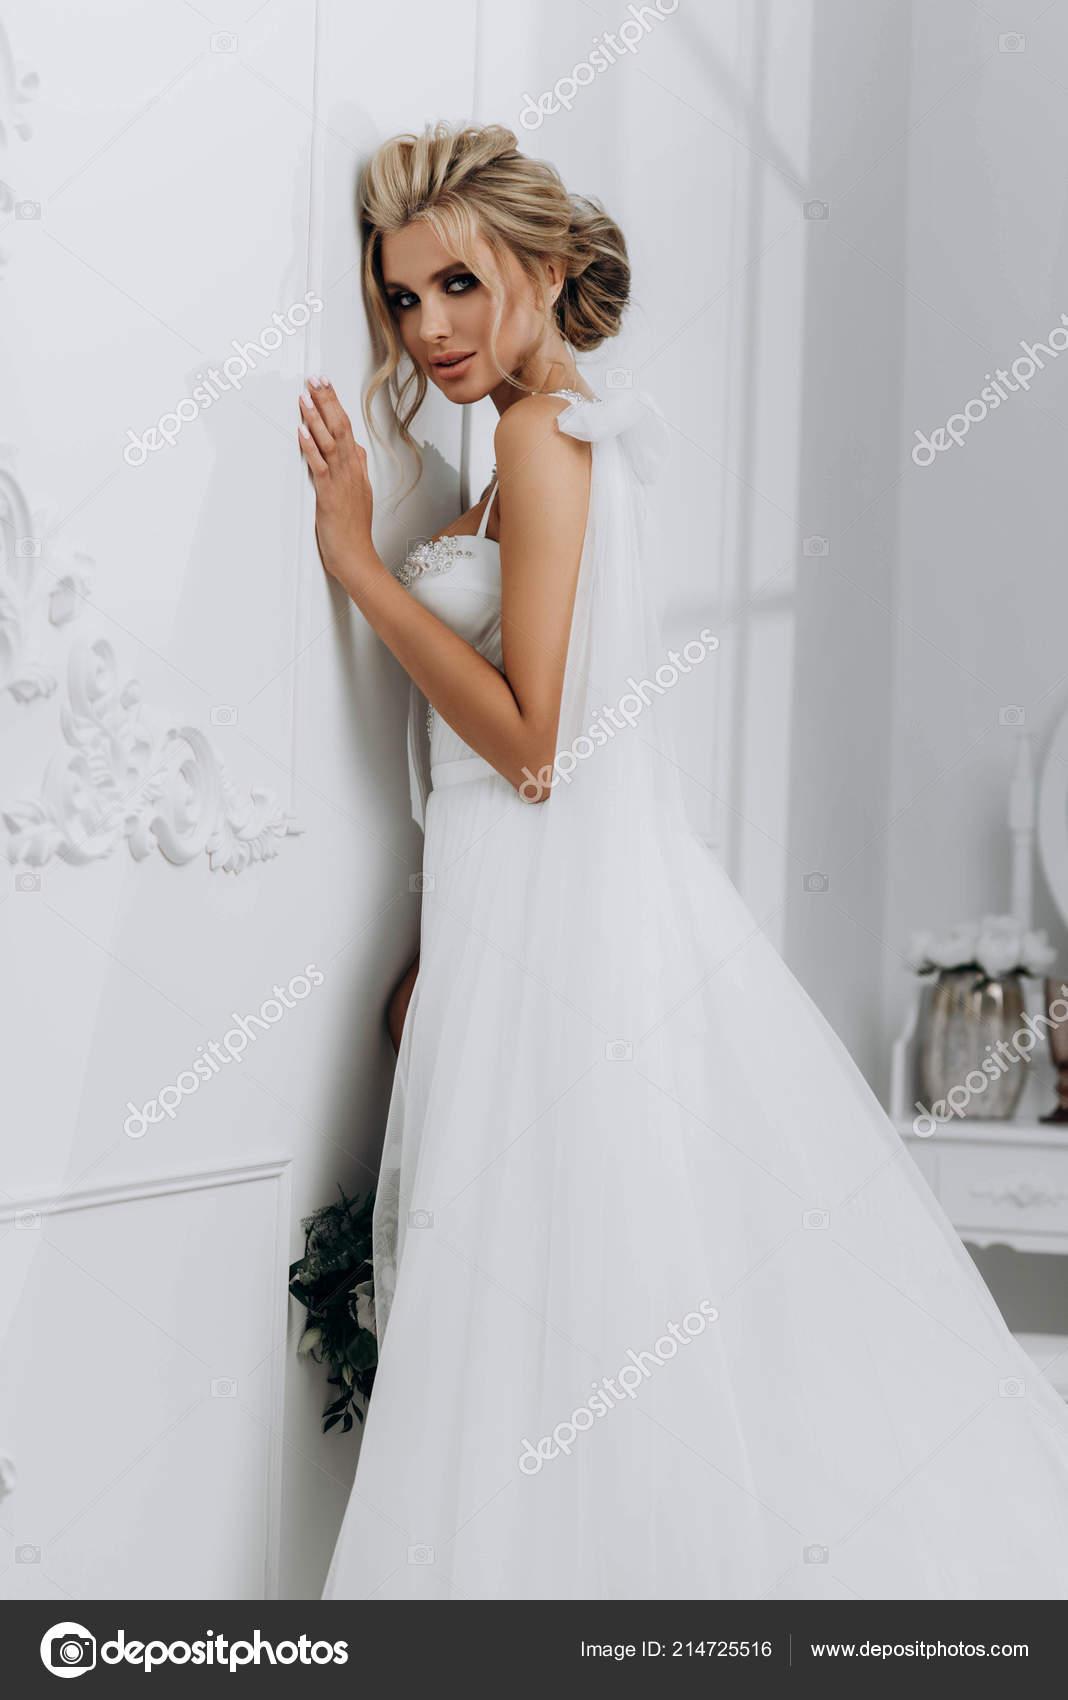 Blonde Wedding Dresses